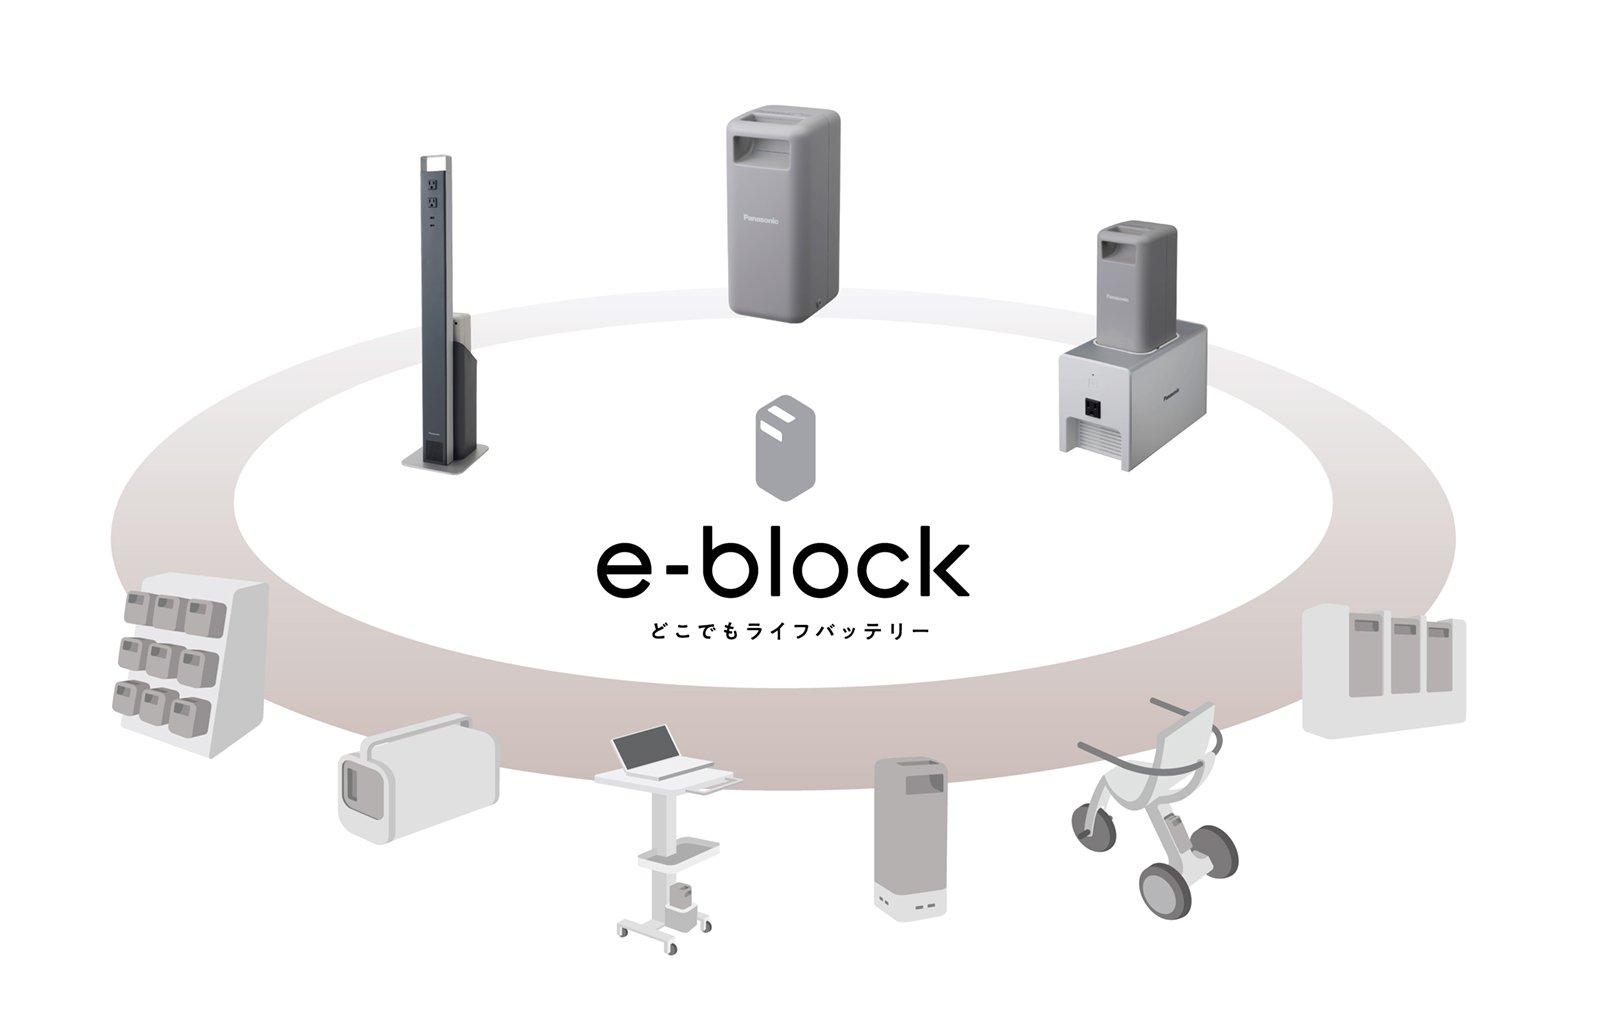 PQB0311A パナソニック 可搬型バッテリー e-block(イーブロック) リチウムイオン蓄電池